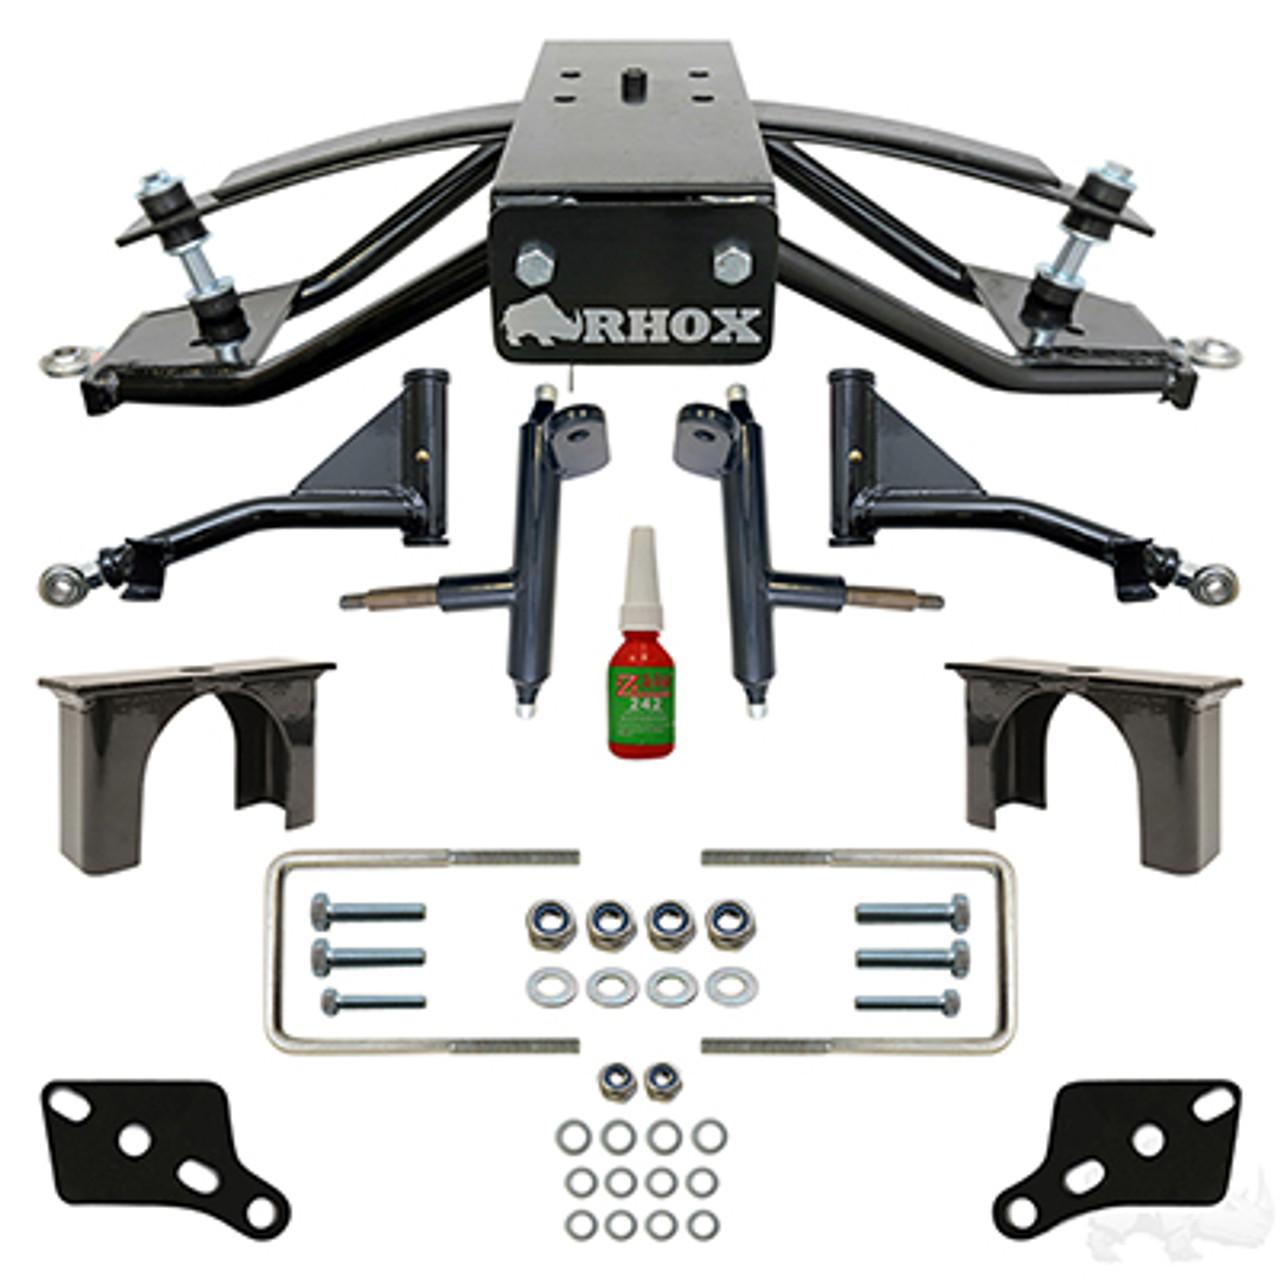 "RHOX Standard A-Arm Lift Kit, 6"" Club Car Precedent"